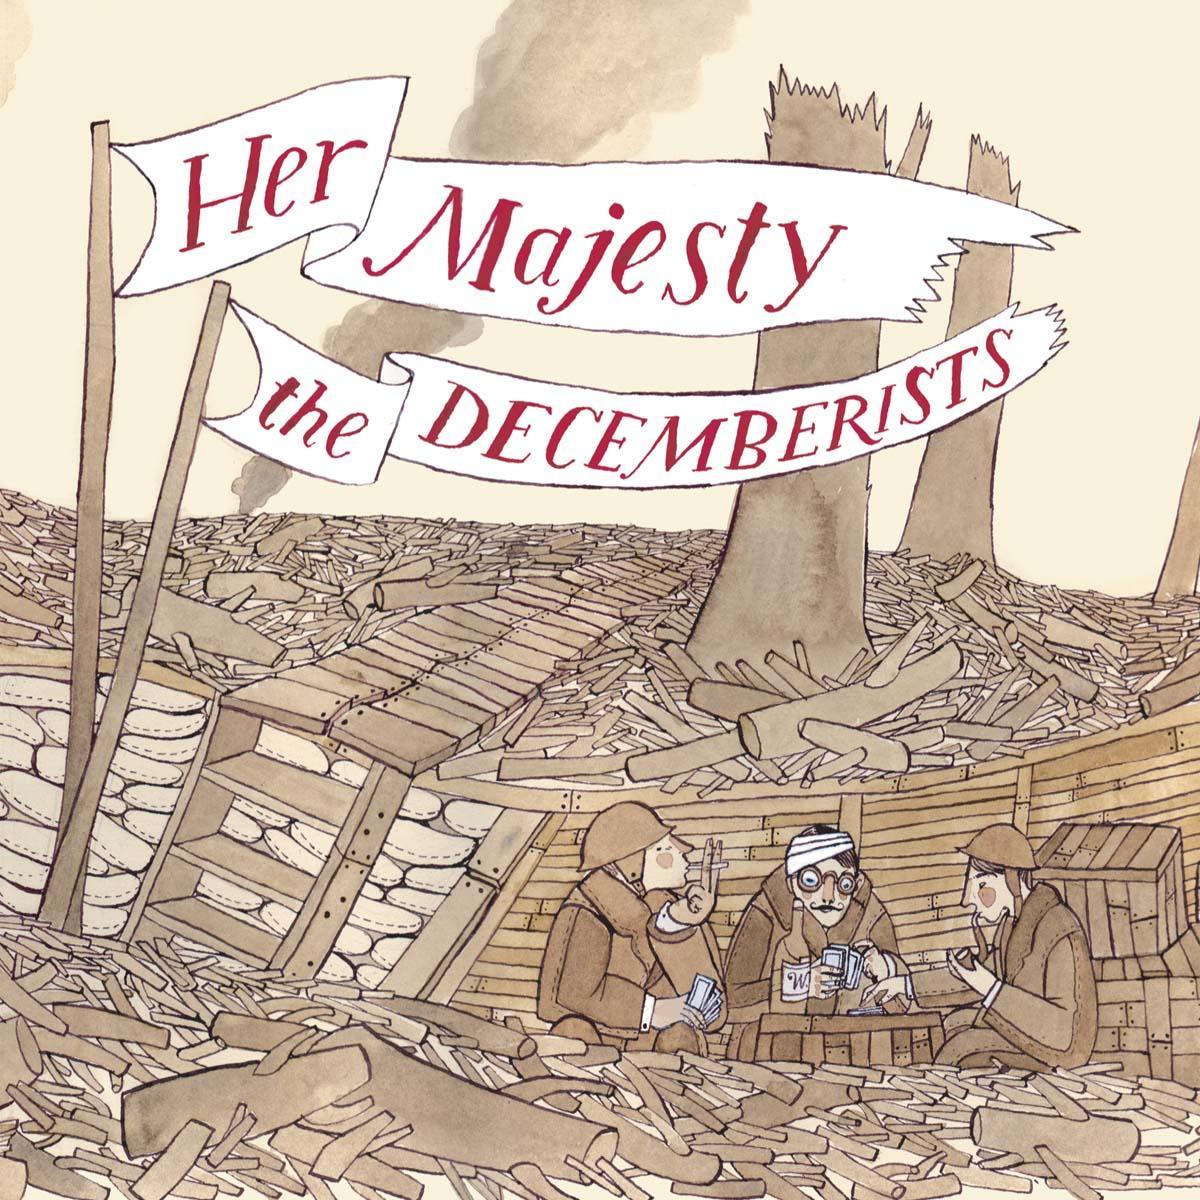 Decemberists - Her Majesty The Decemberists [LP]